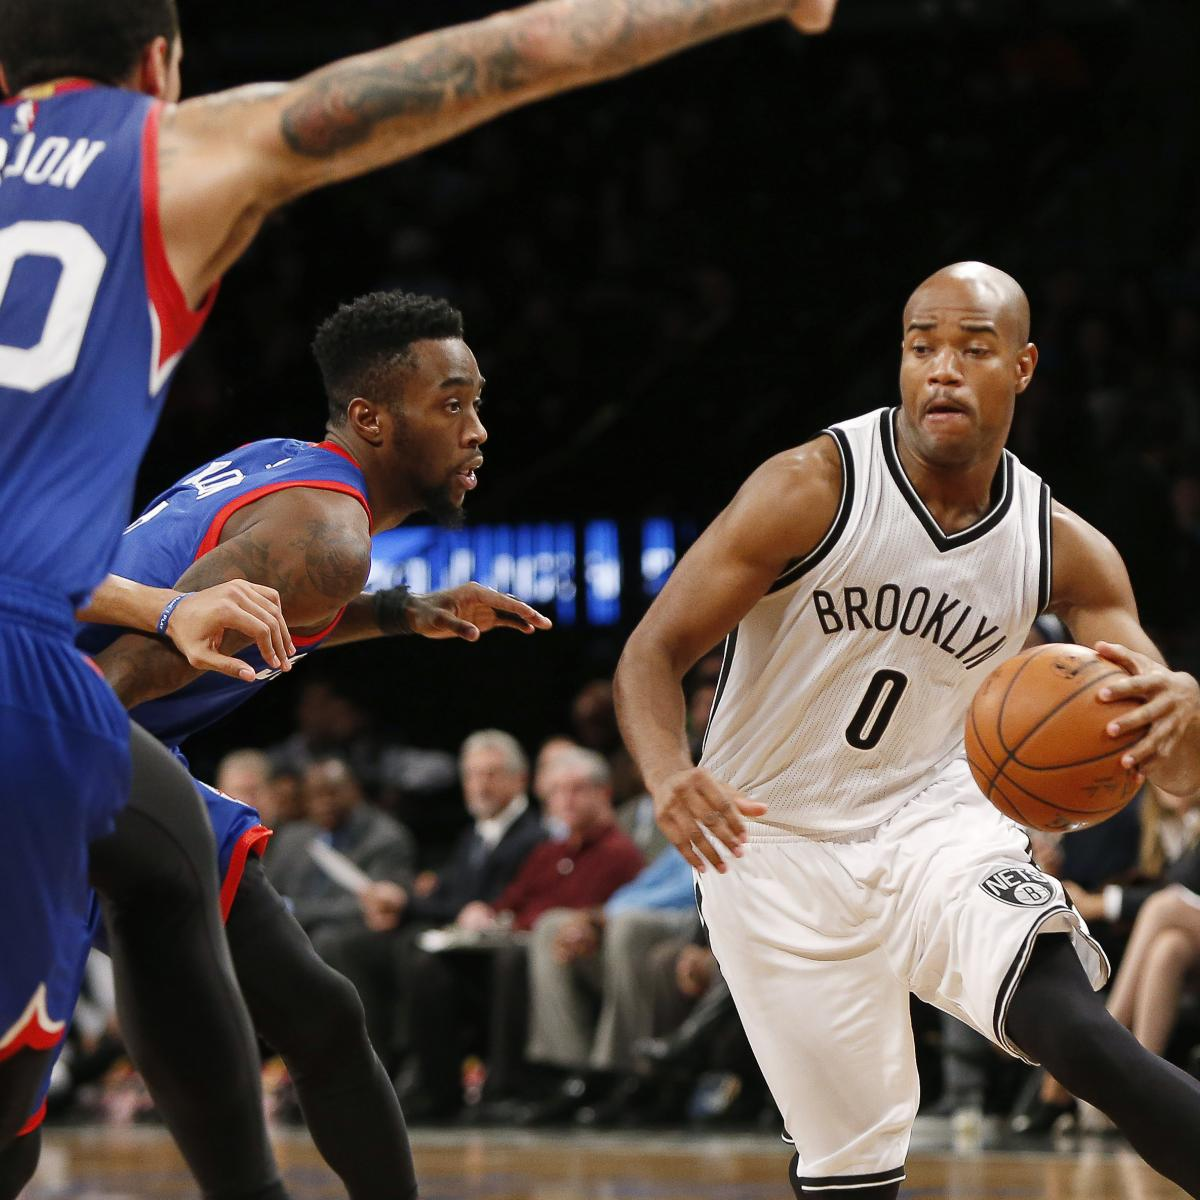 Philadelphia 76ers Vs. Brooklyn Nets 10/20/14: Video